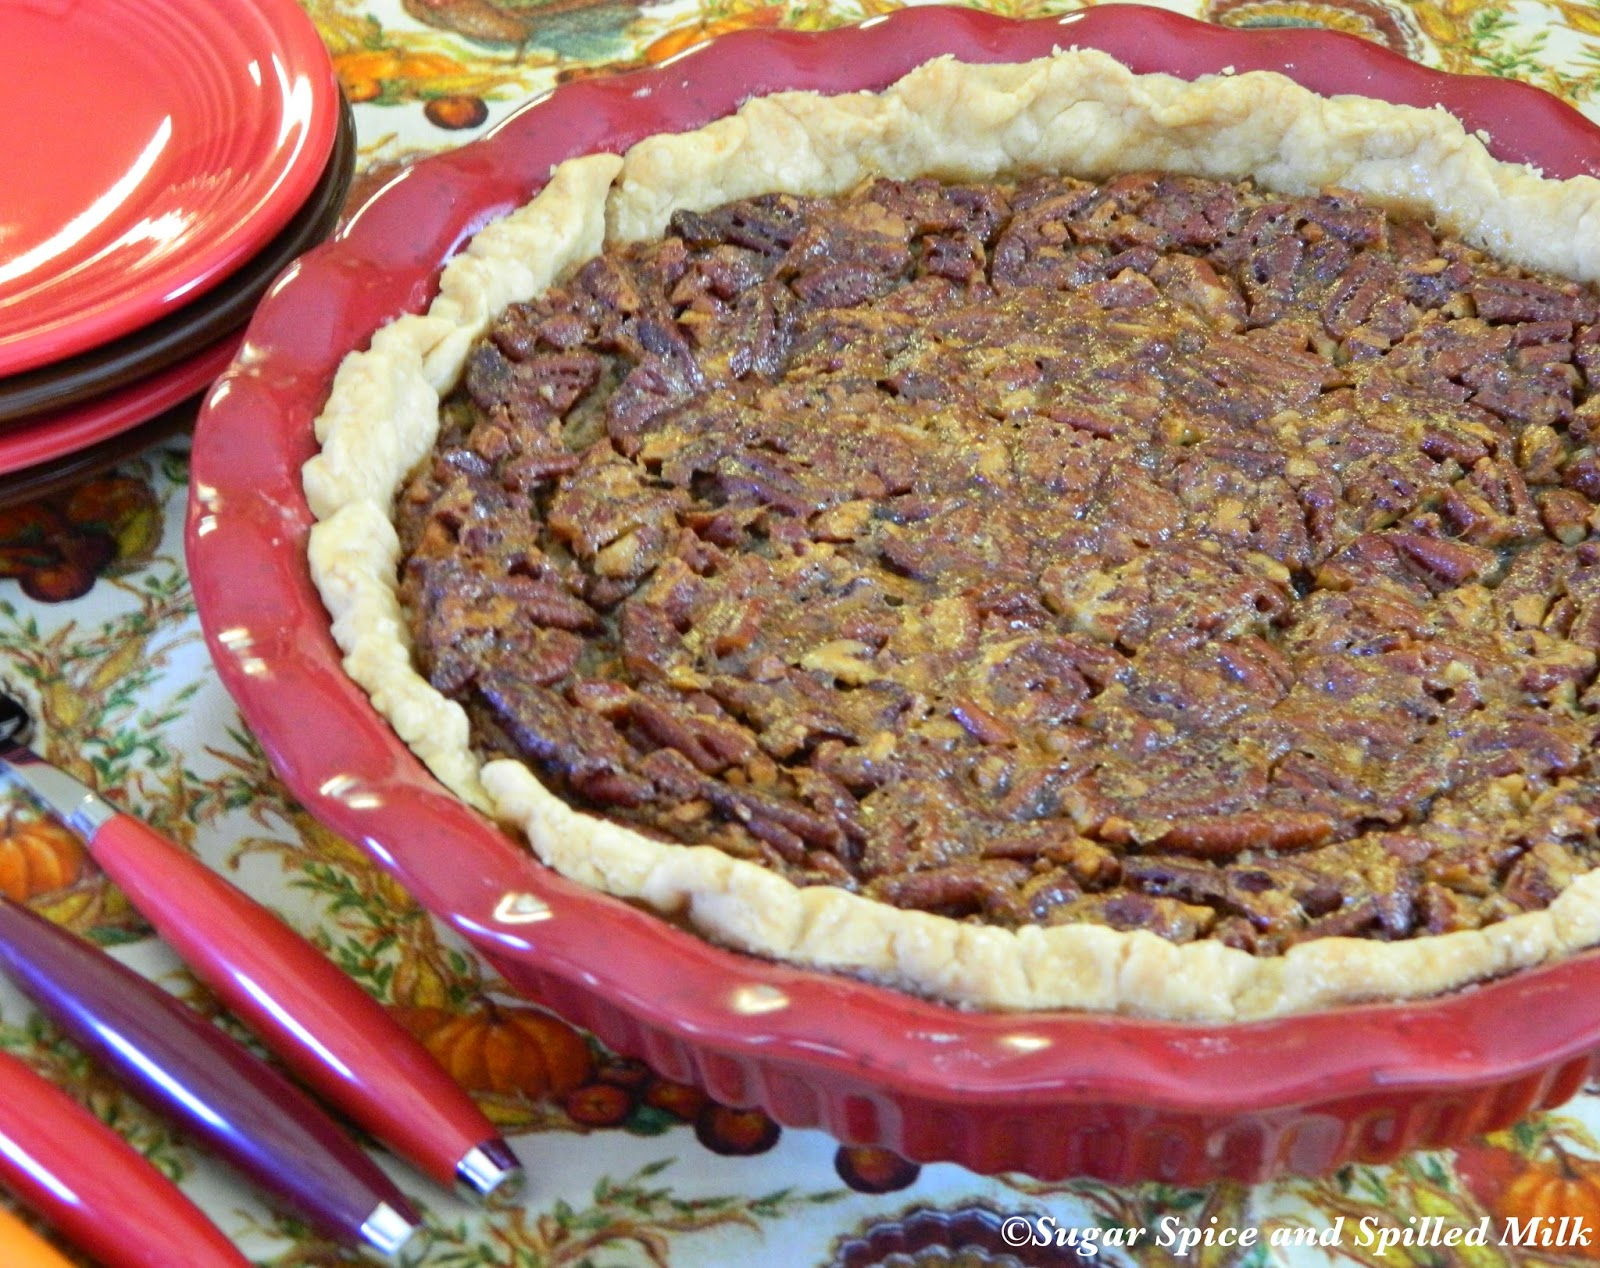 Sugar Spice and Spilled Milk: Chocolate Pecan Pie